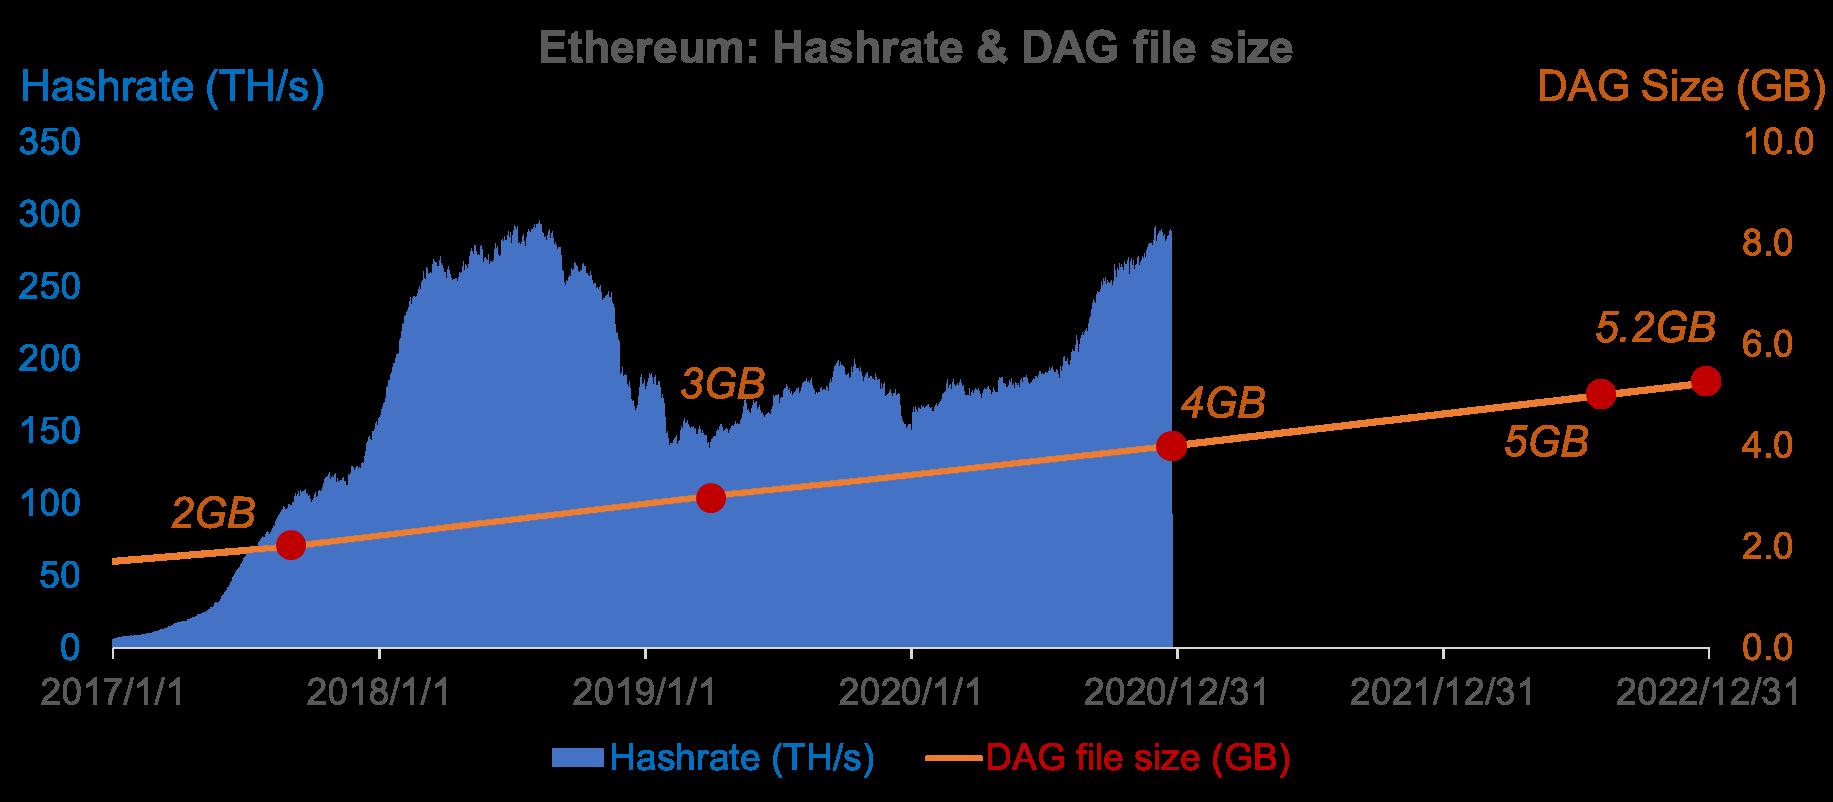 ethereum network size